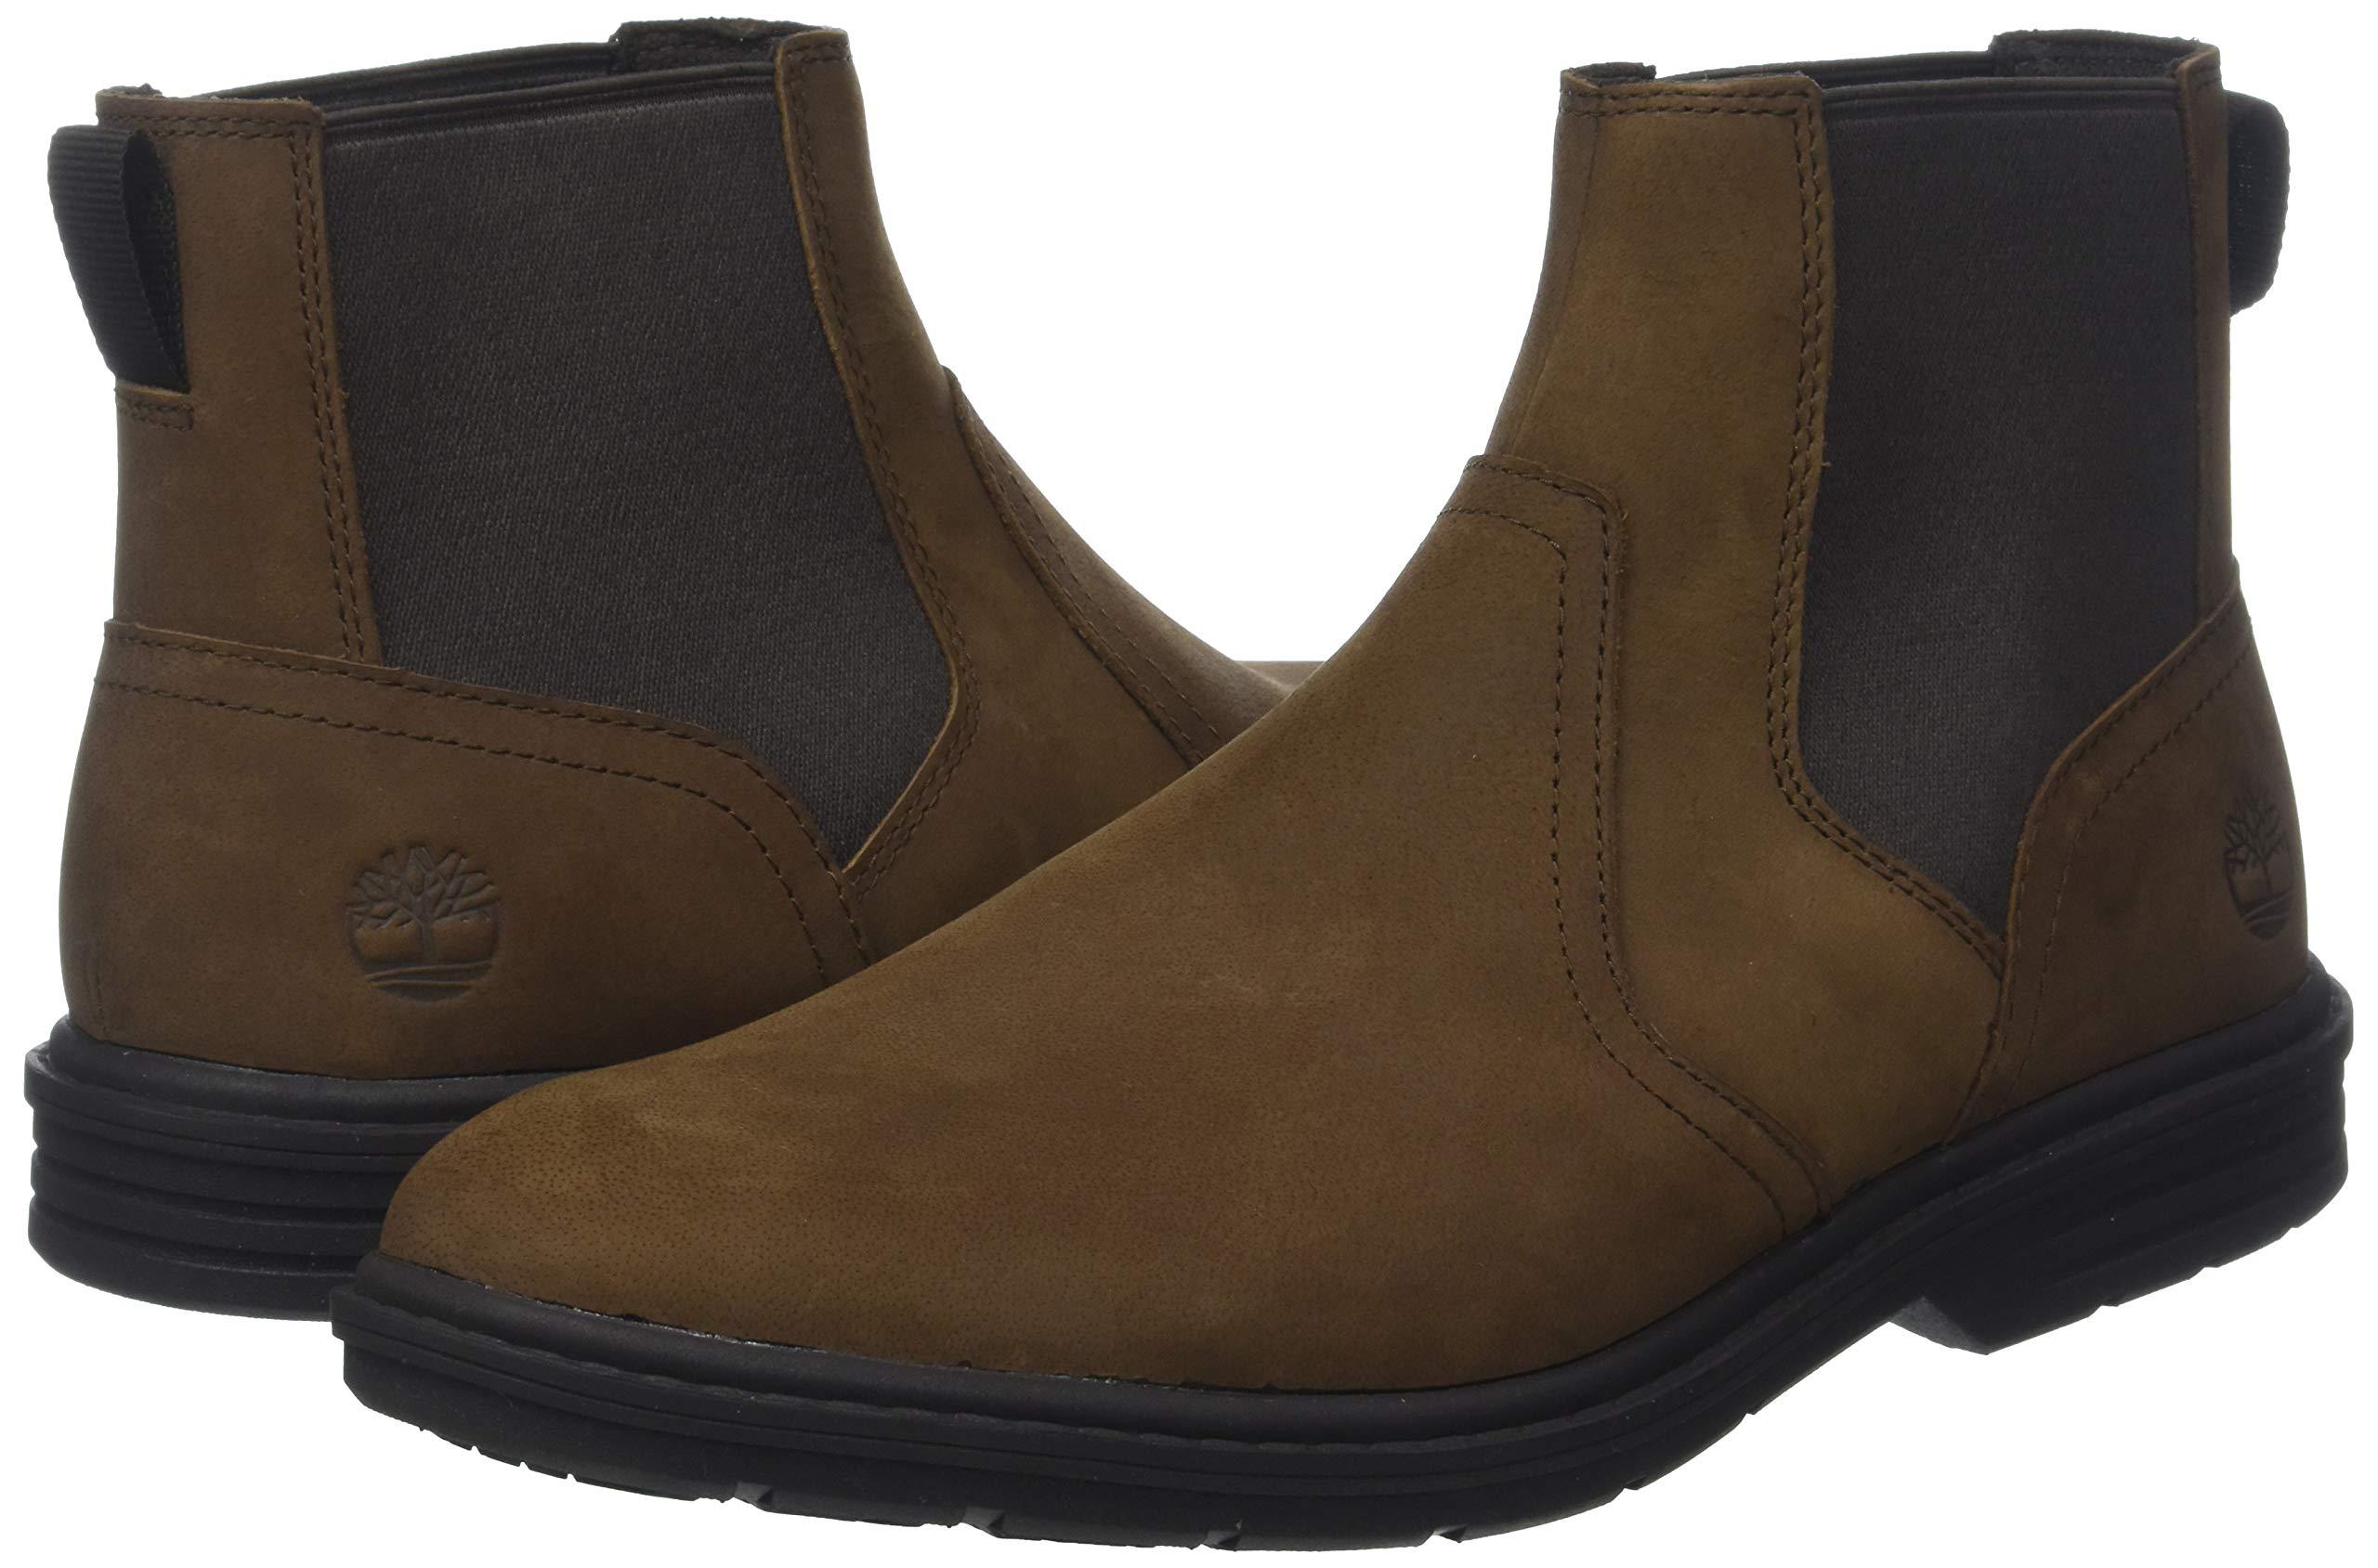 Teleférico disfraz aeropuerto  Timberland Men's Sawyer Lane Chelsea Ankle Boots- Buy Online in Aruba at  aruba.desertcart.com. ProductId : 218023356.